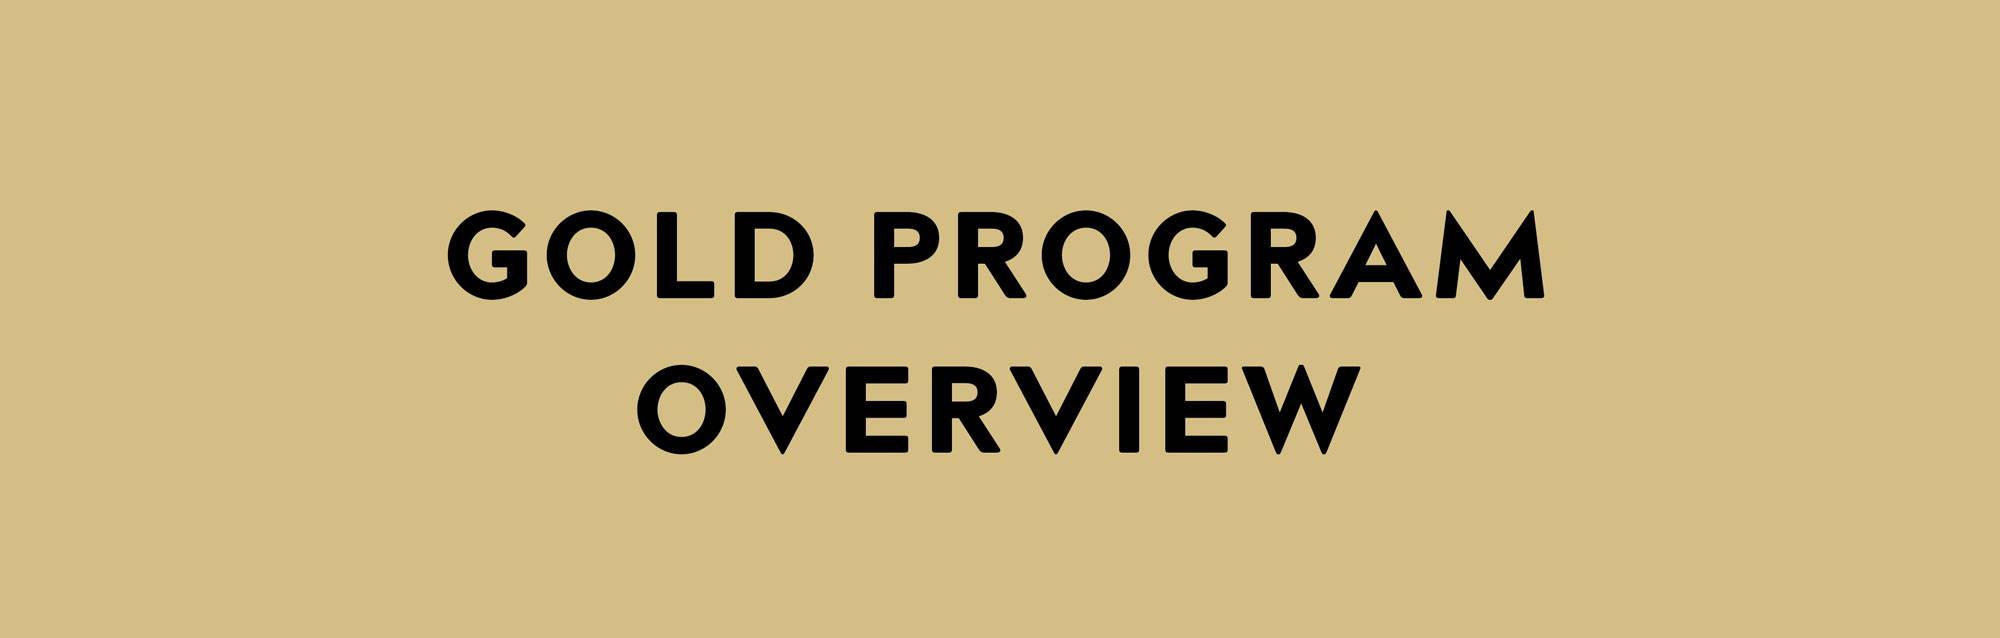 LOCTOTE gold ambassador overview